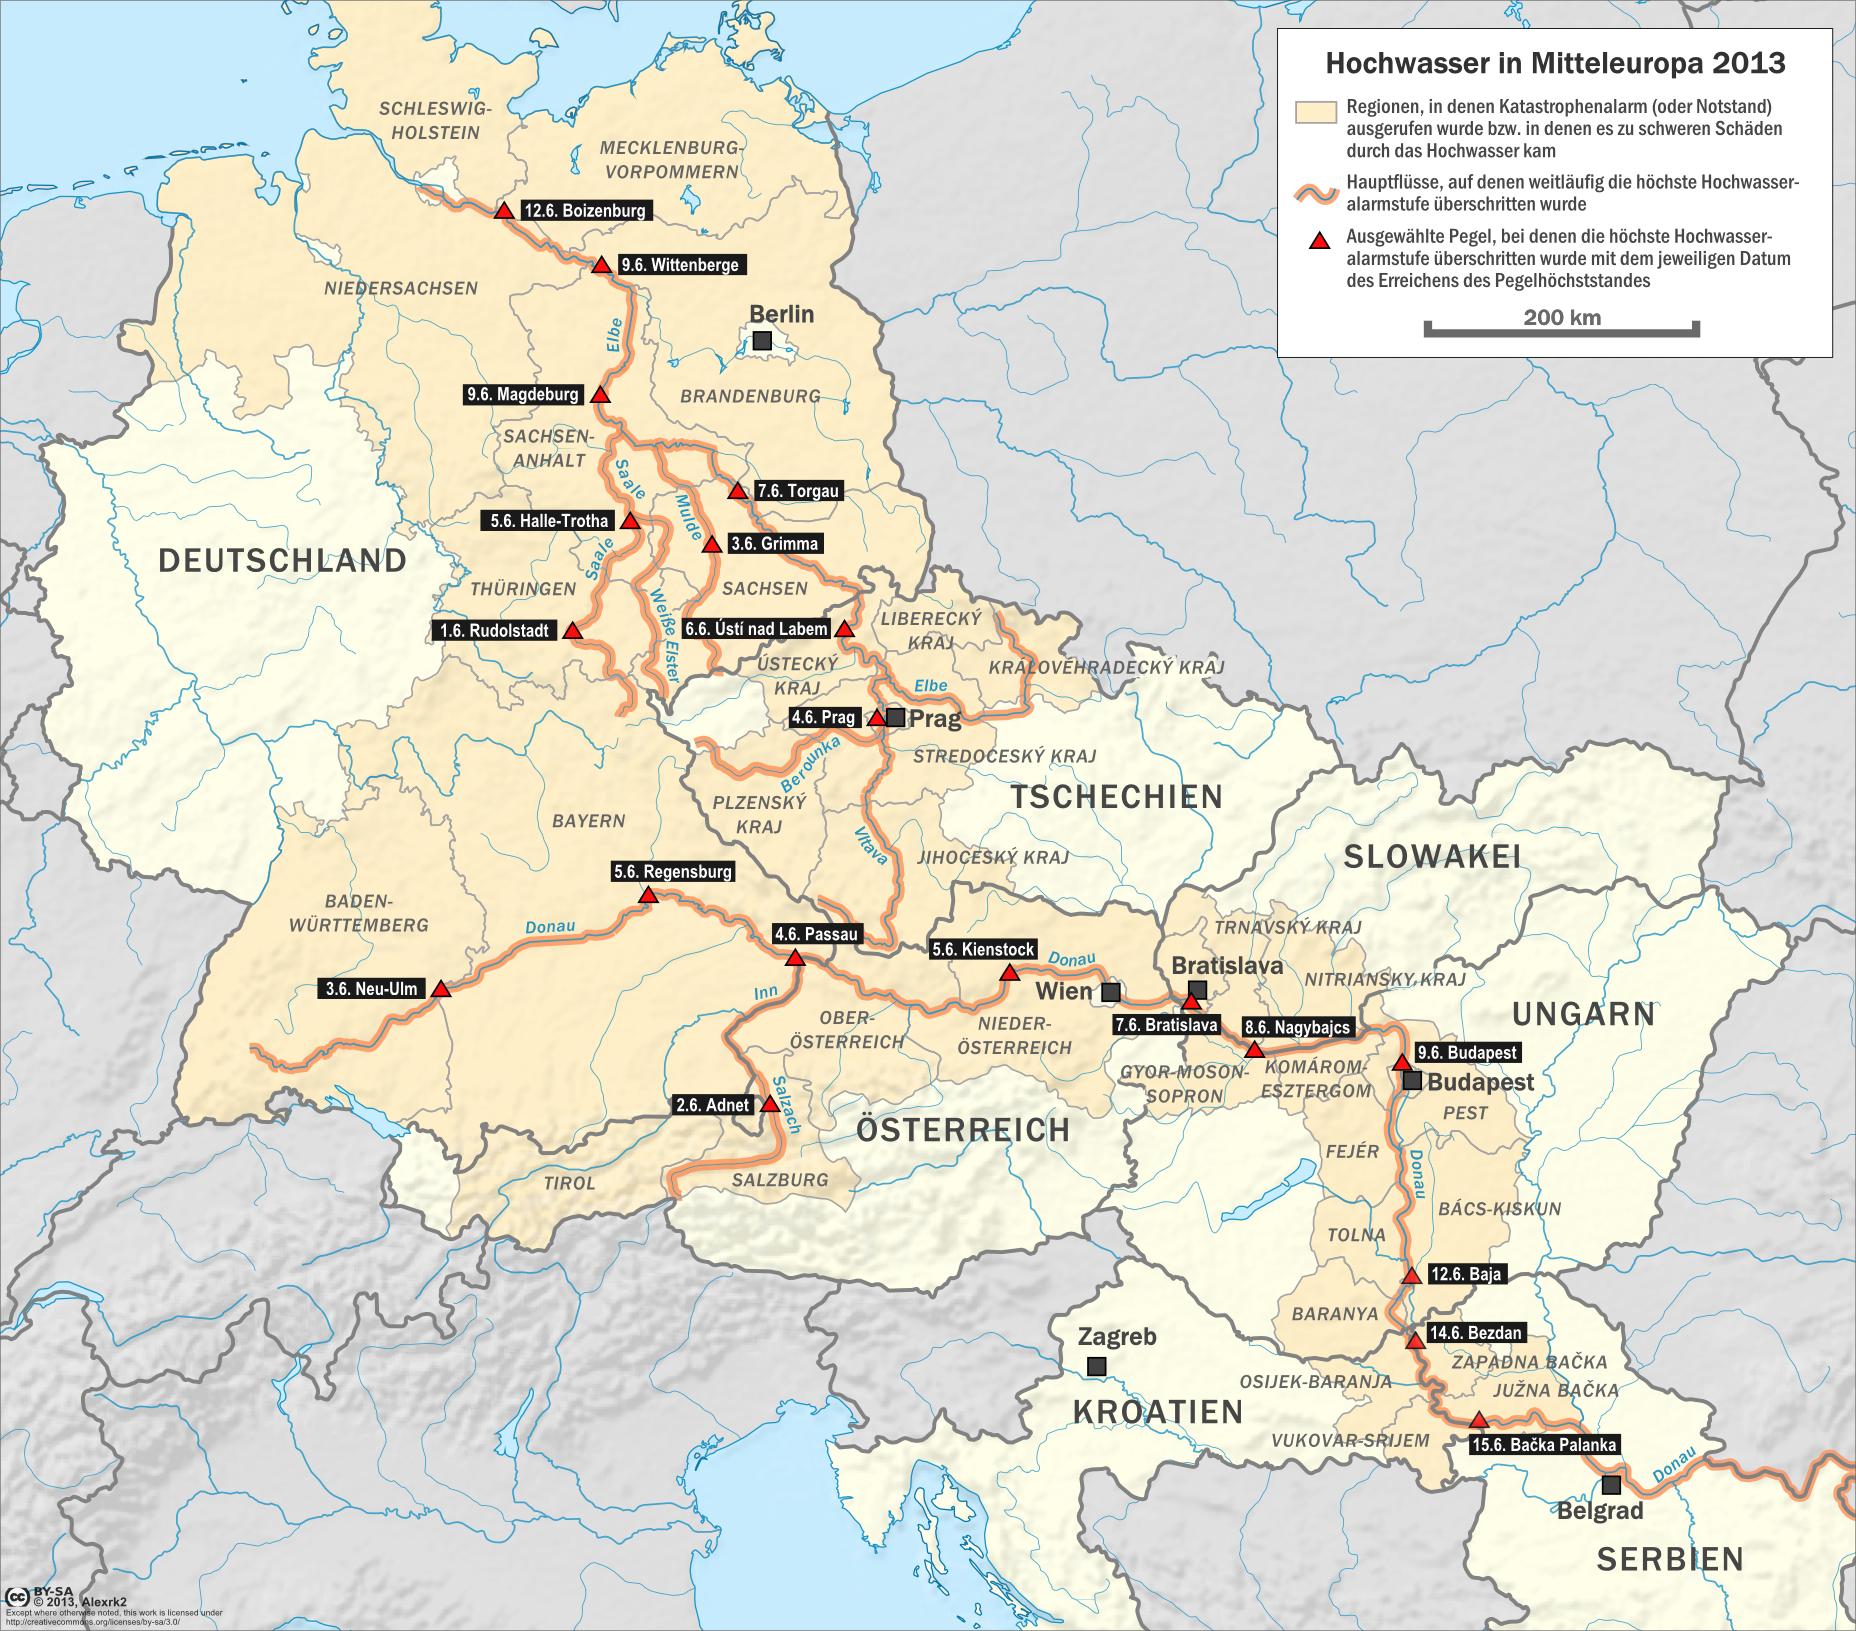 karte mitteleuropa File:Karte Hochwasser in Mitteleuropa 2013.png   Wikimedia Commons